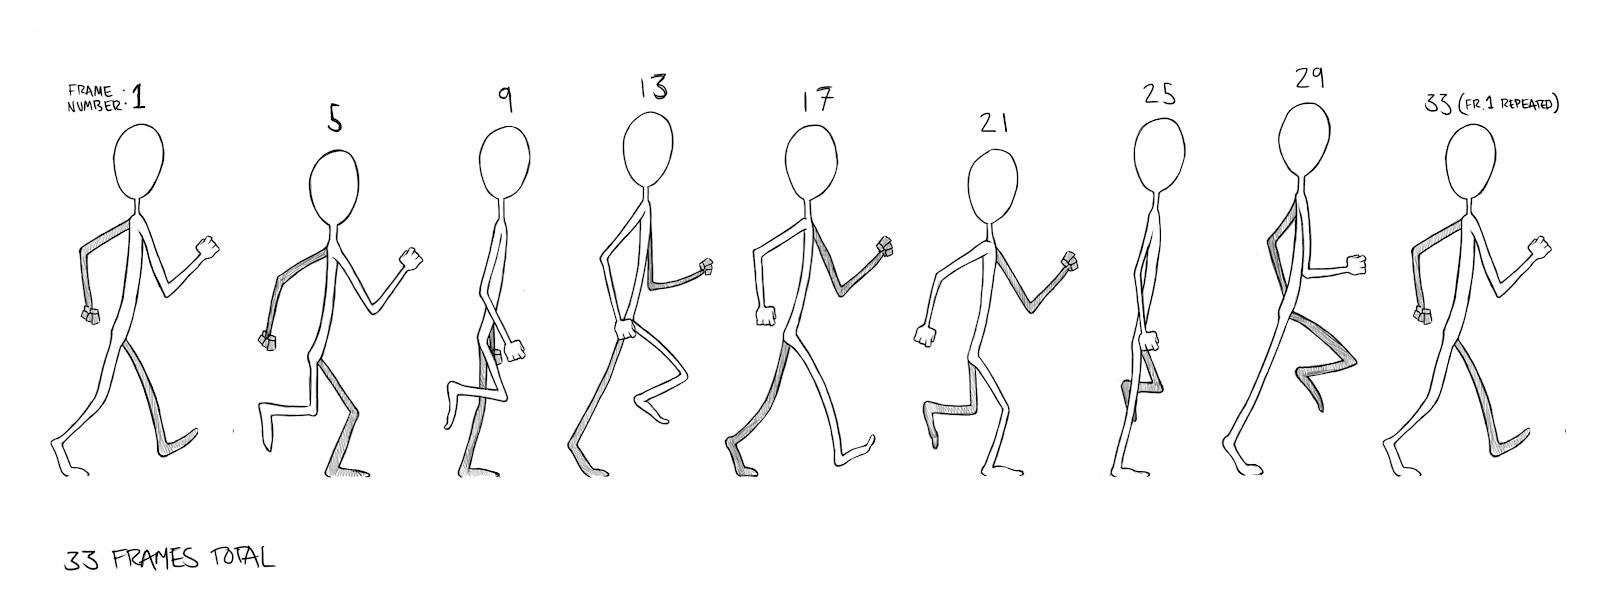 Unique Mlp Walk Cycle Frames Adornment - Ideas de Marcos ...